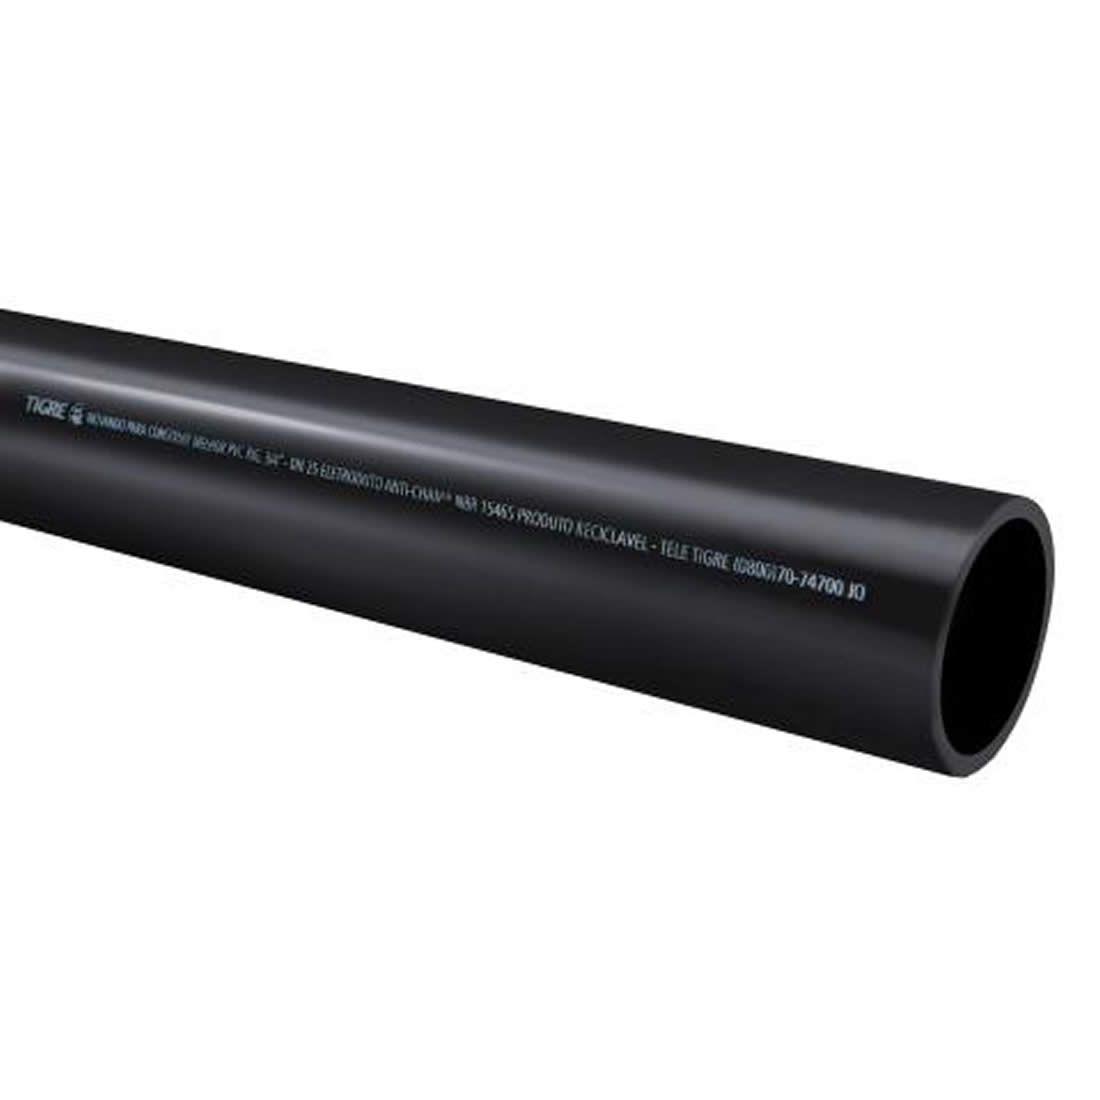 Tubo Eletroduto Soldável Antichama 20mm X 3 Metros Tigre